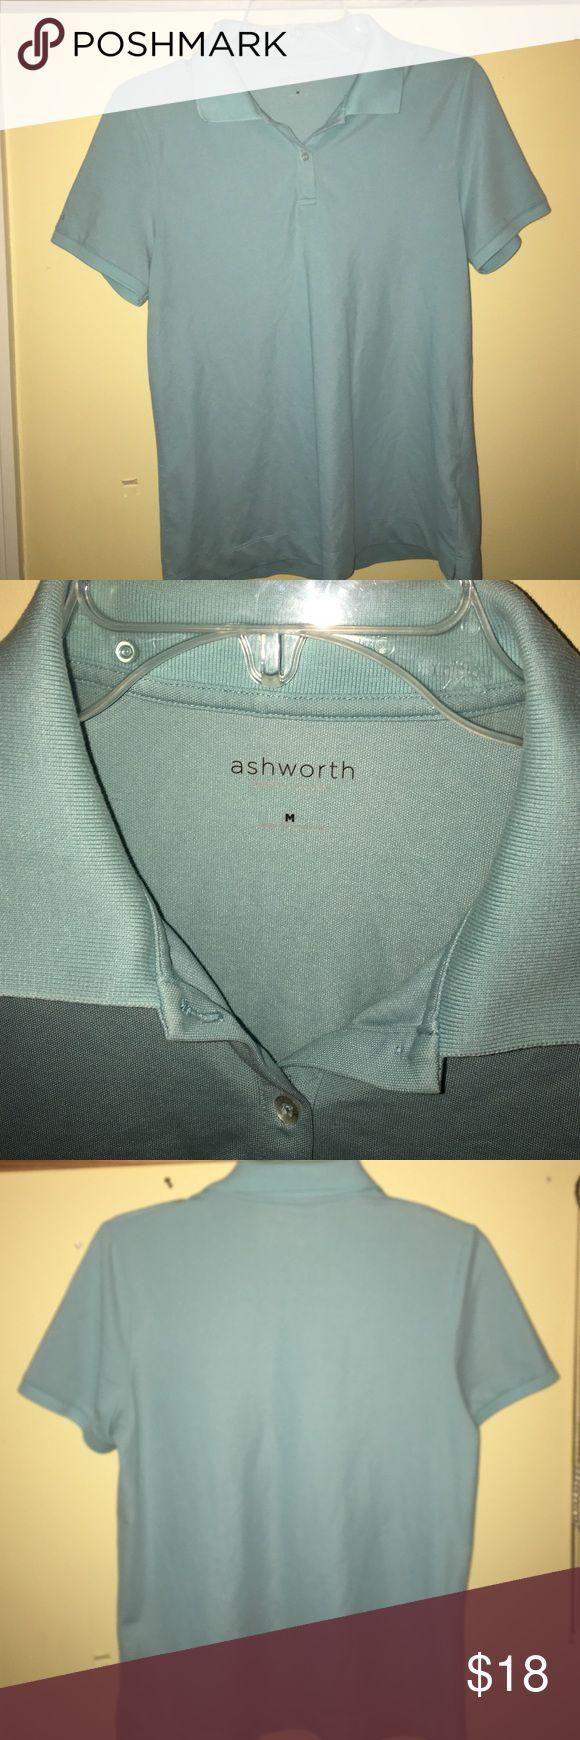 Light blue ash worth golf shirt - new Ashworth golf shirt Ashworth Tops Tees - Short Sleeve